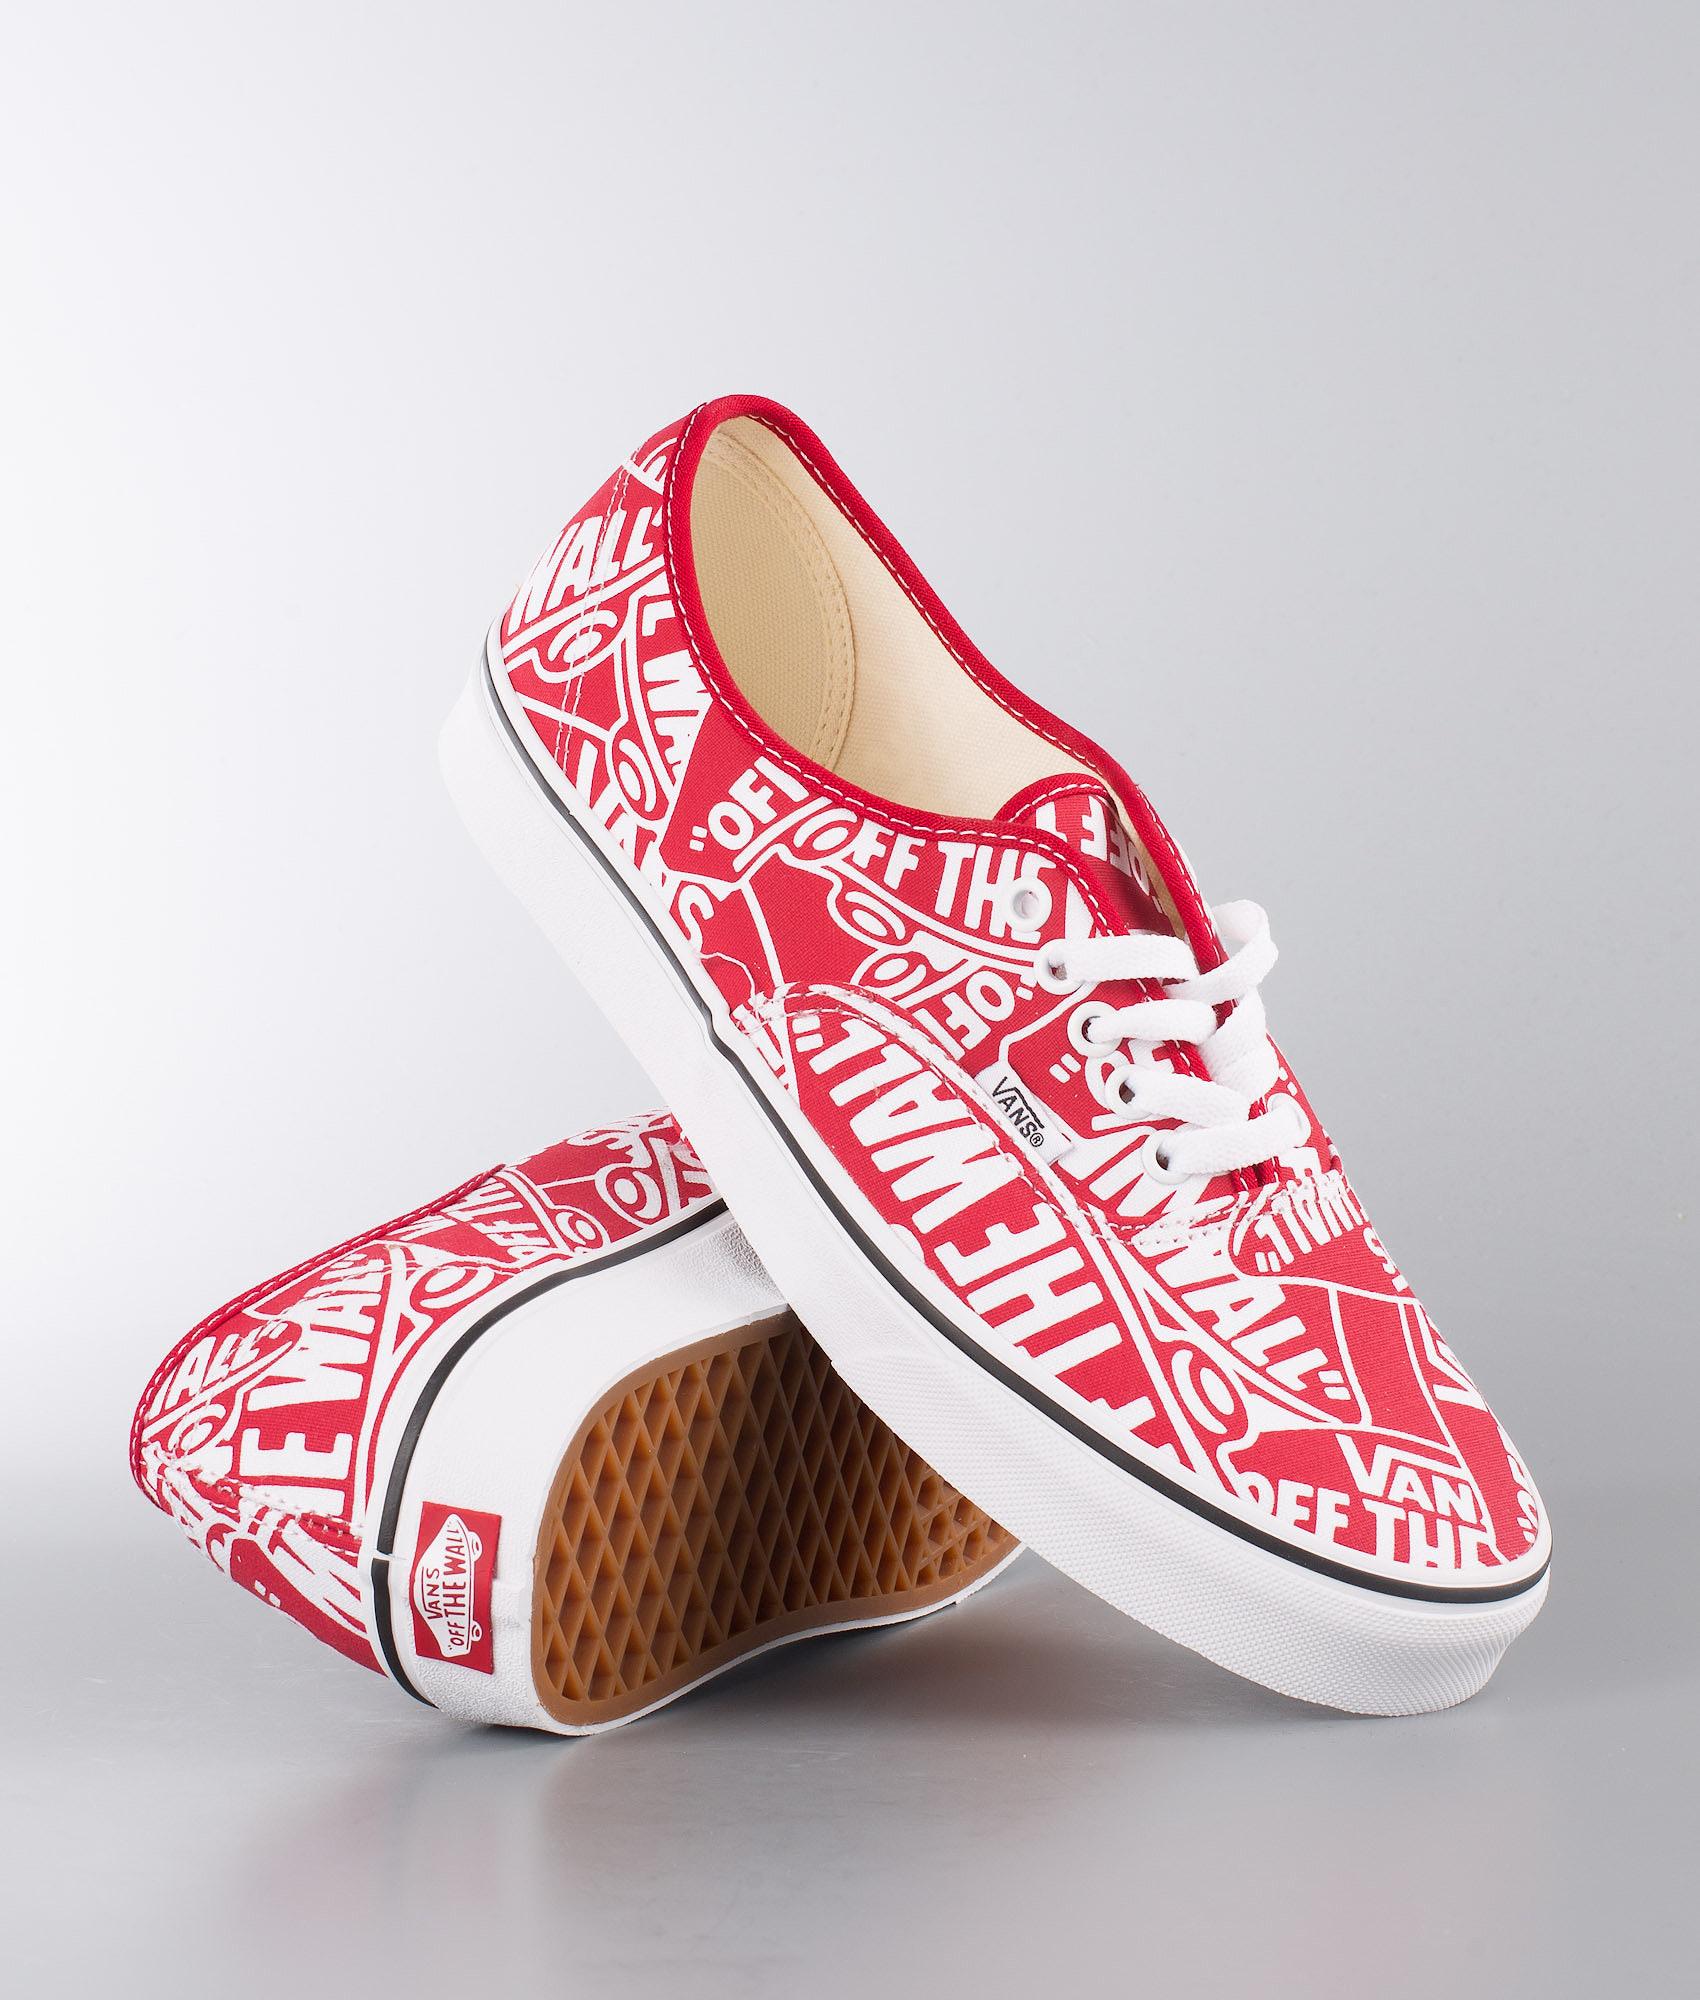 c598b192b4263a Vans Authentic Shoes (Otw Repeat) Red True White - Ridestore.com